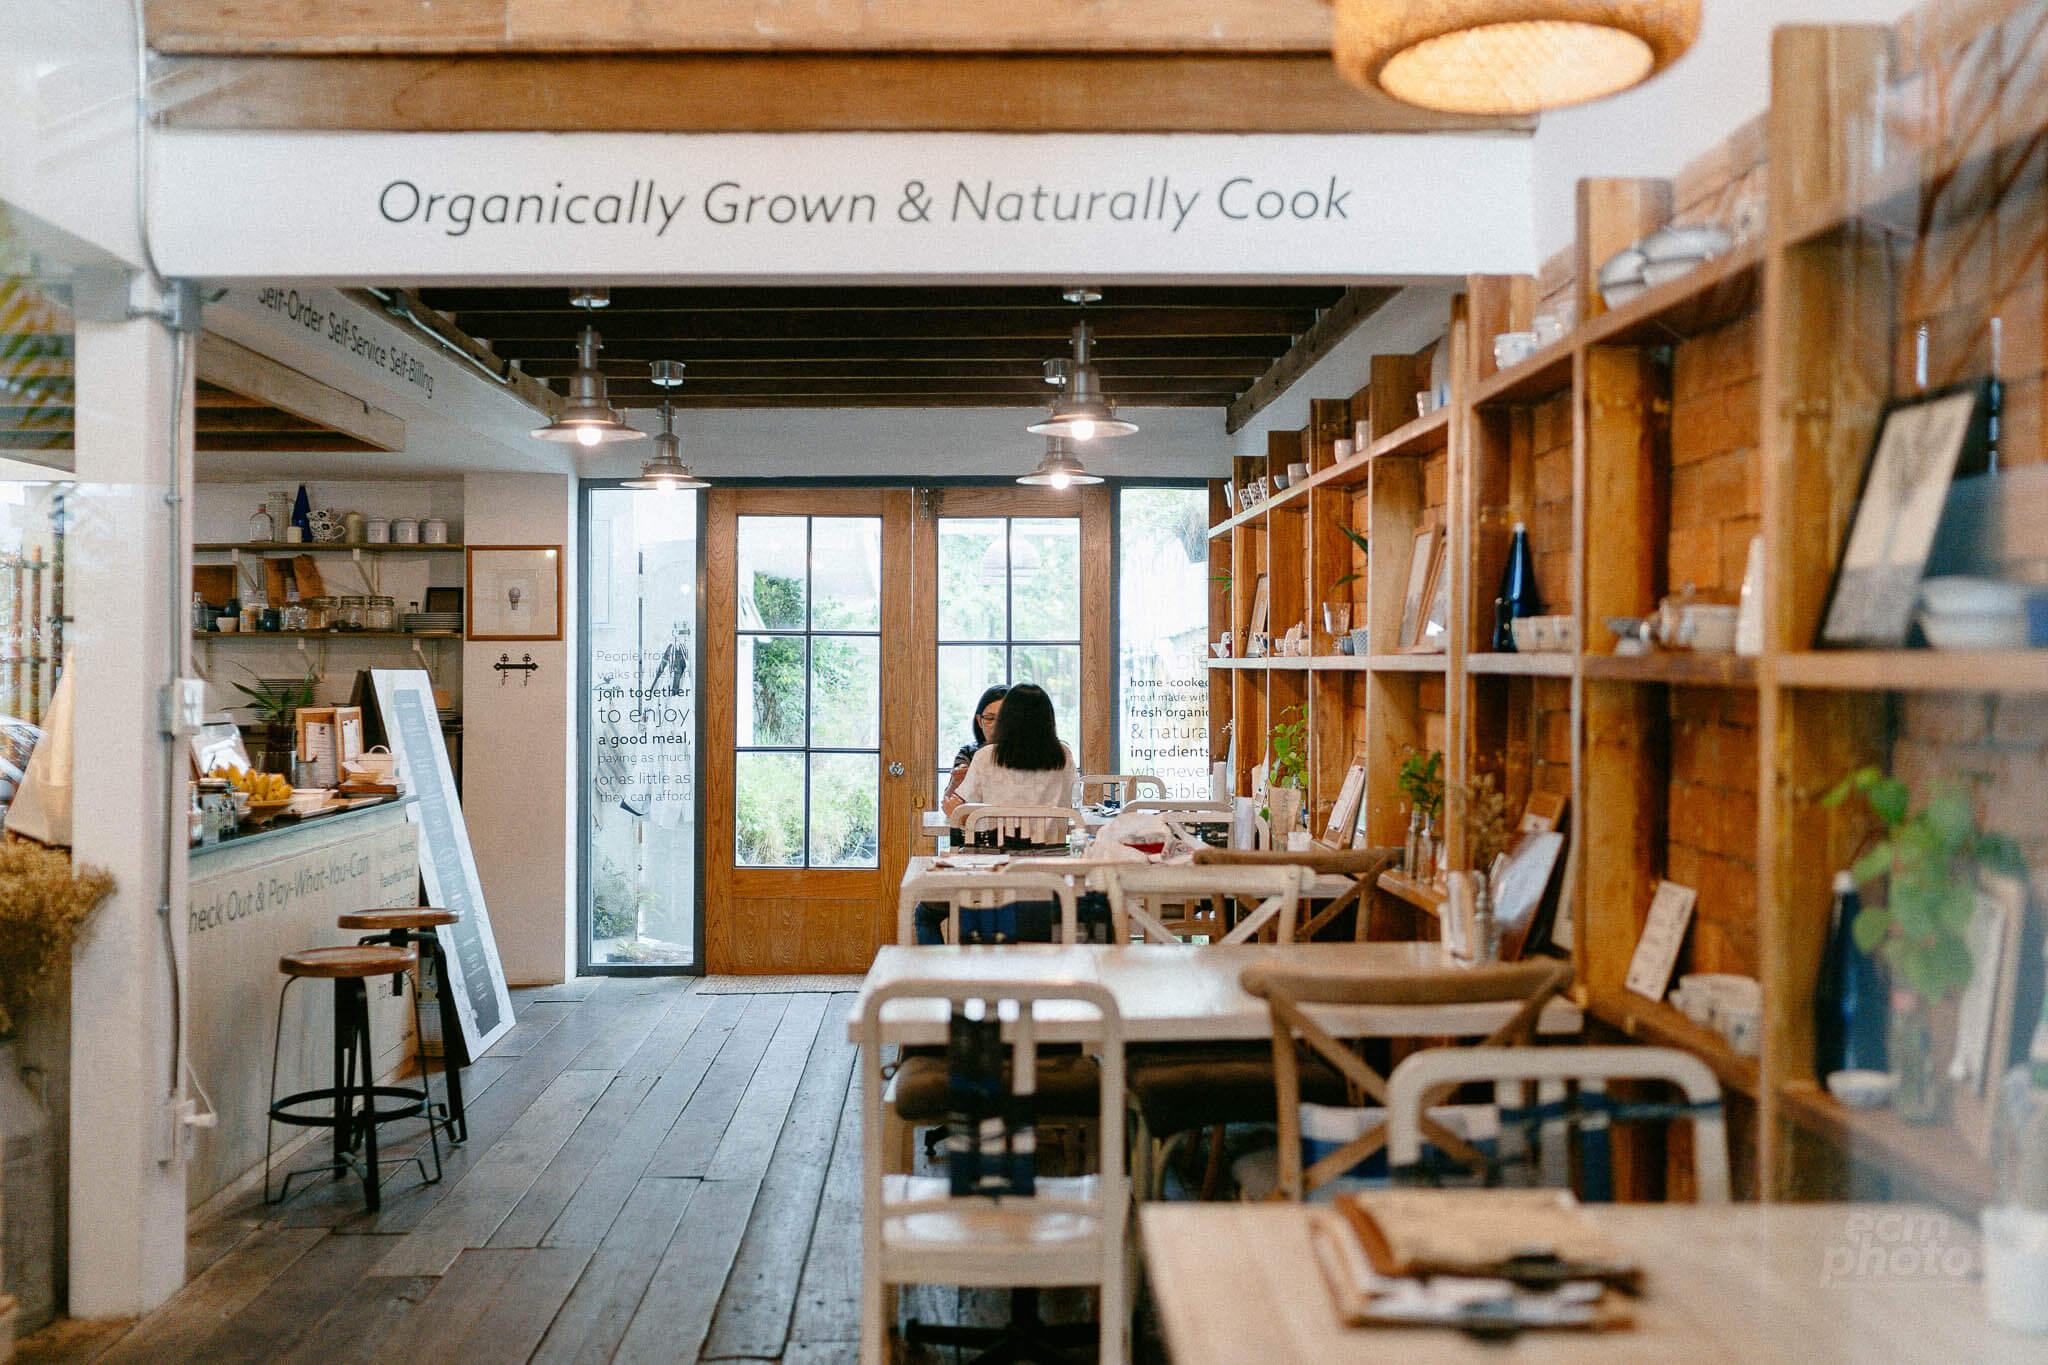 TAAN (ทาน) ORGANIC CAFE คุณทานอิ่มแค่ไหนก็จ่ายตามต้องการ 26 - cafe